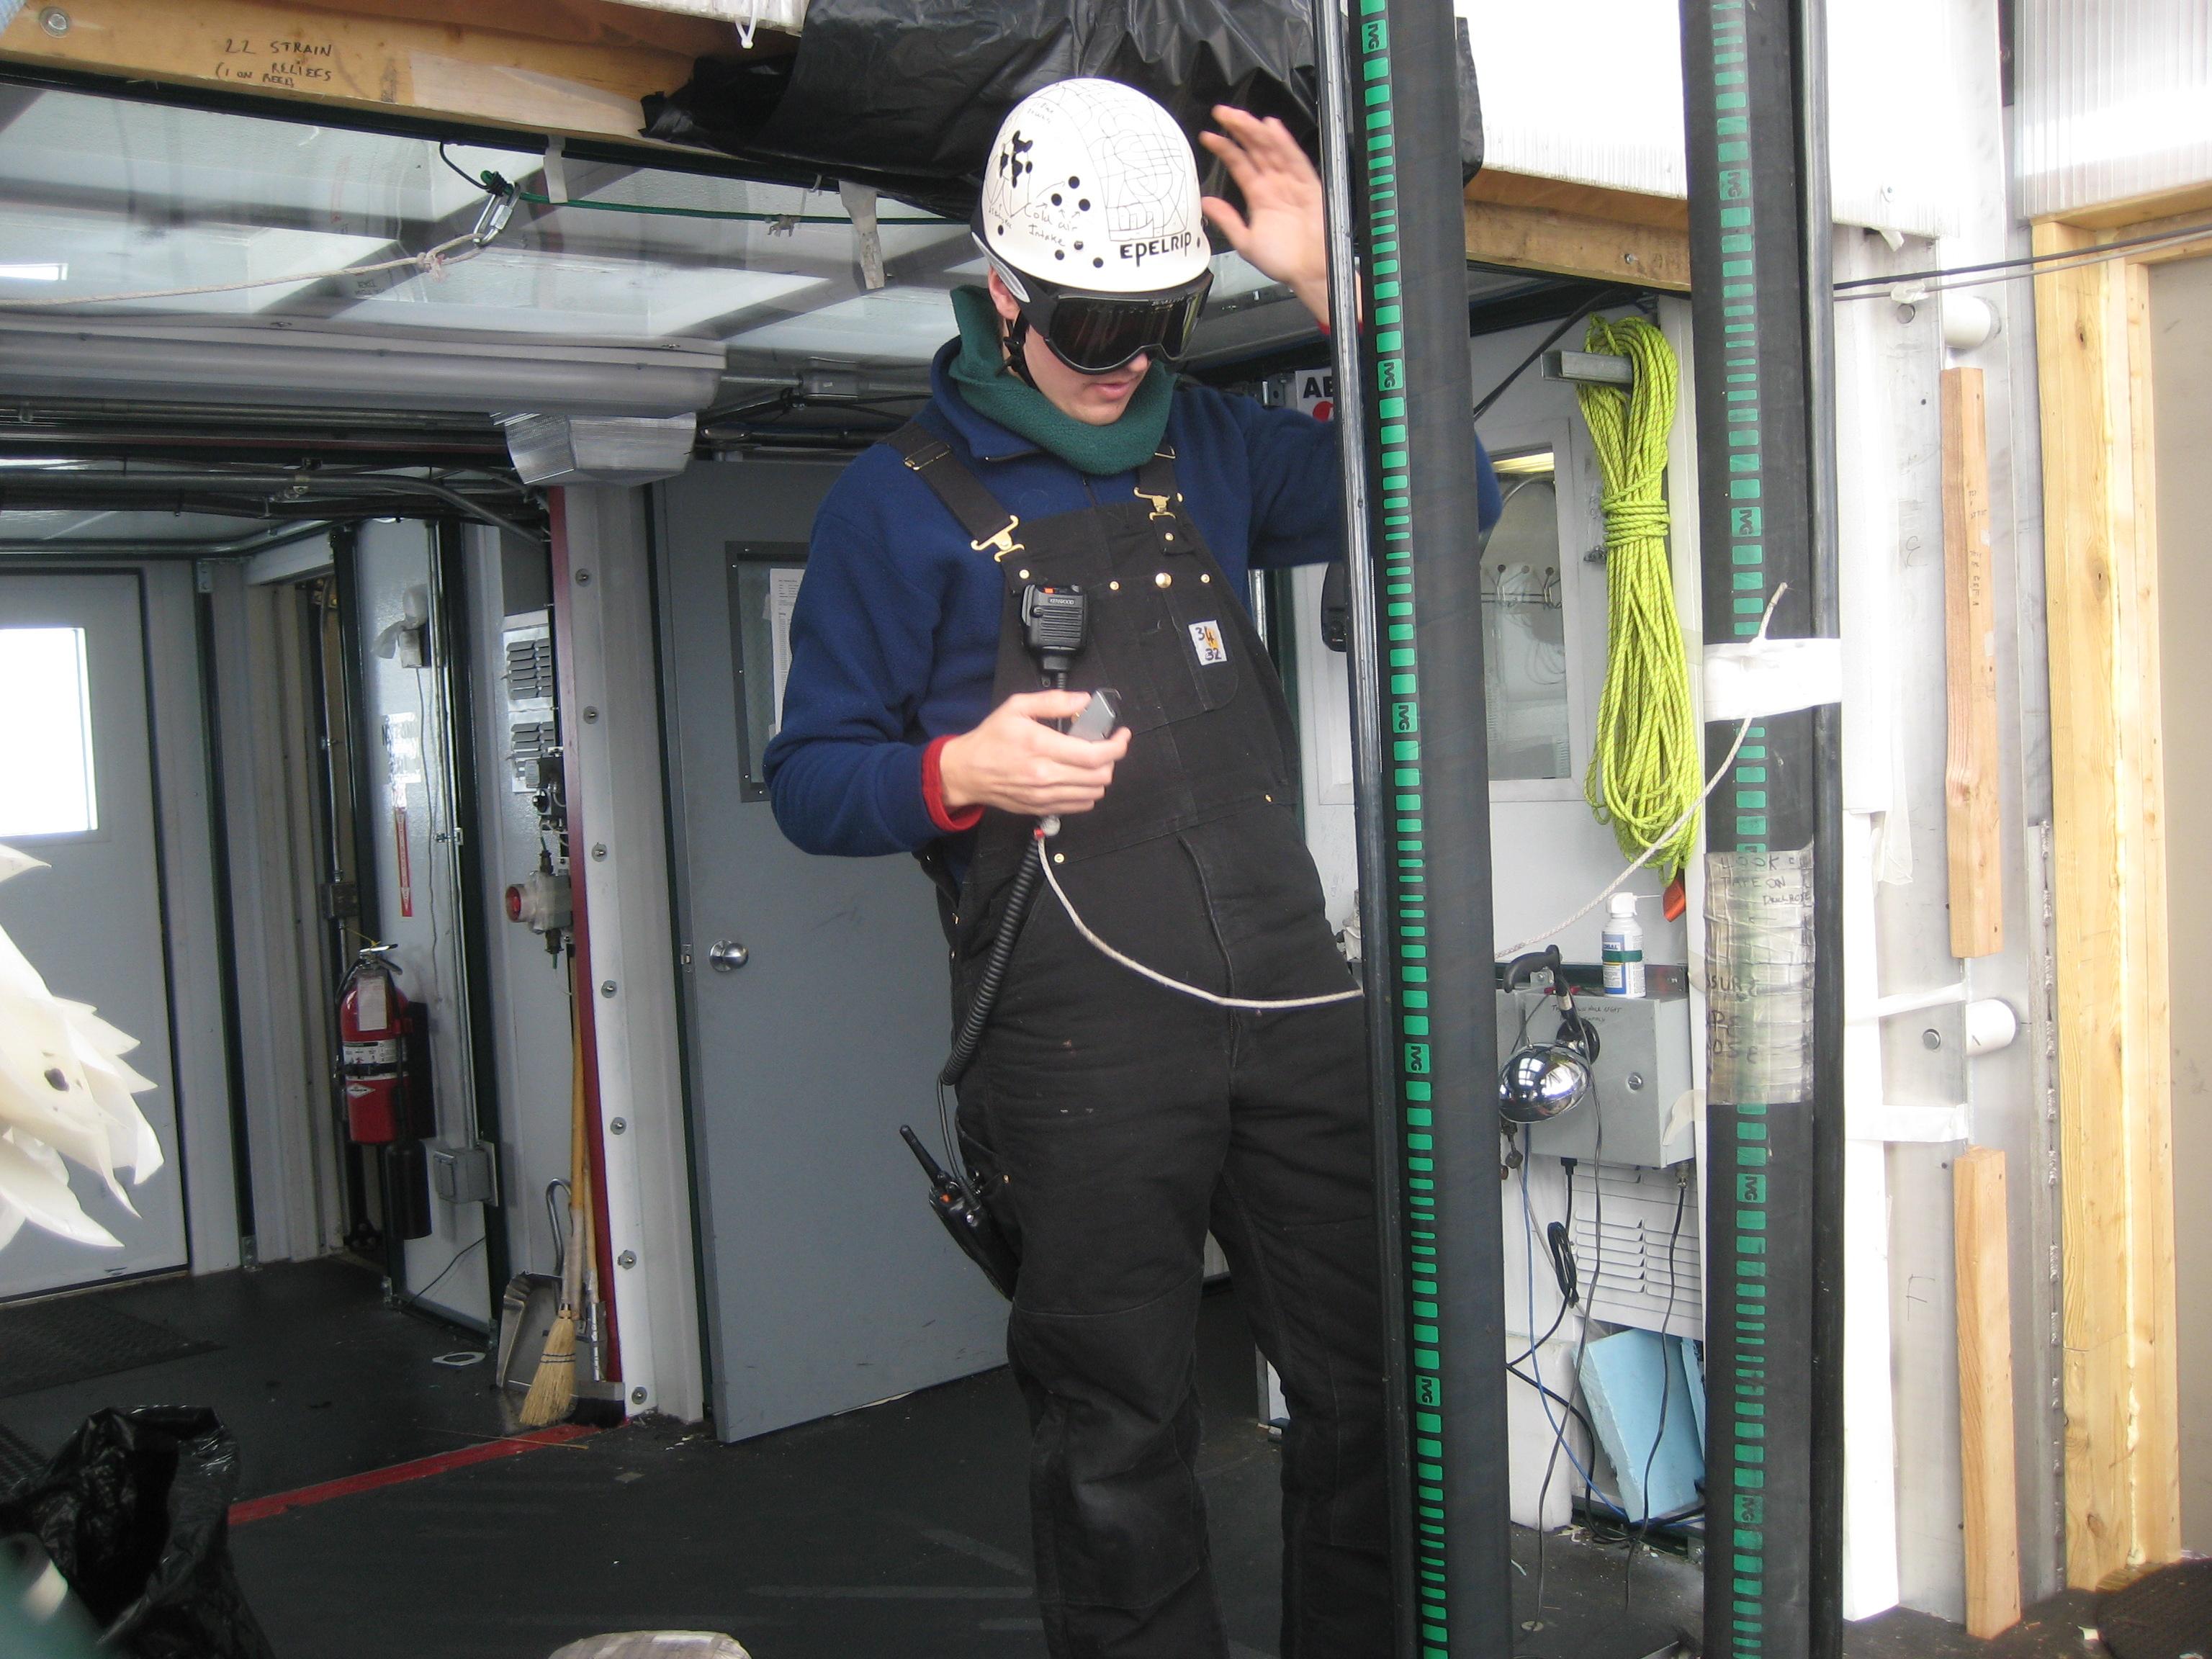 Steve Faulkner antarctic diller and researcher.